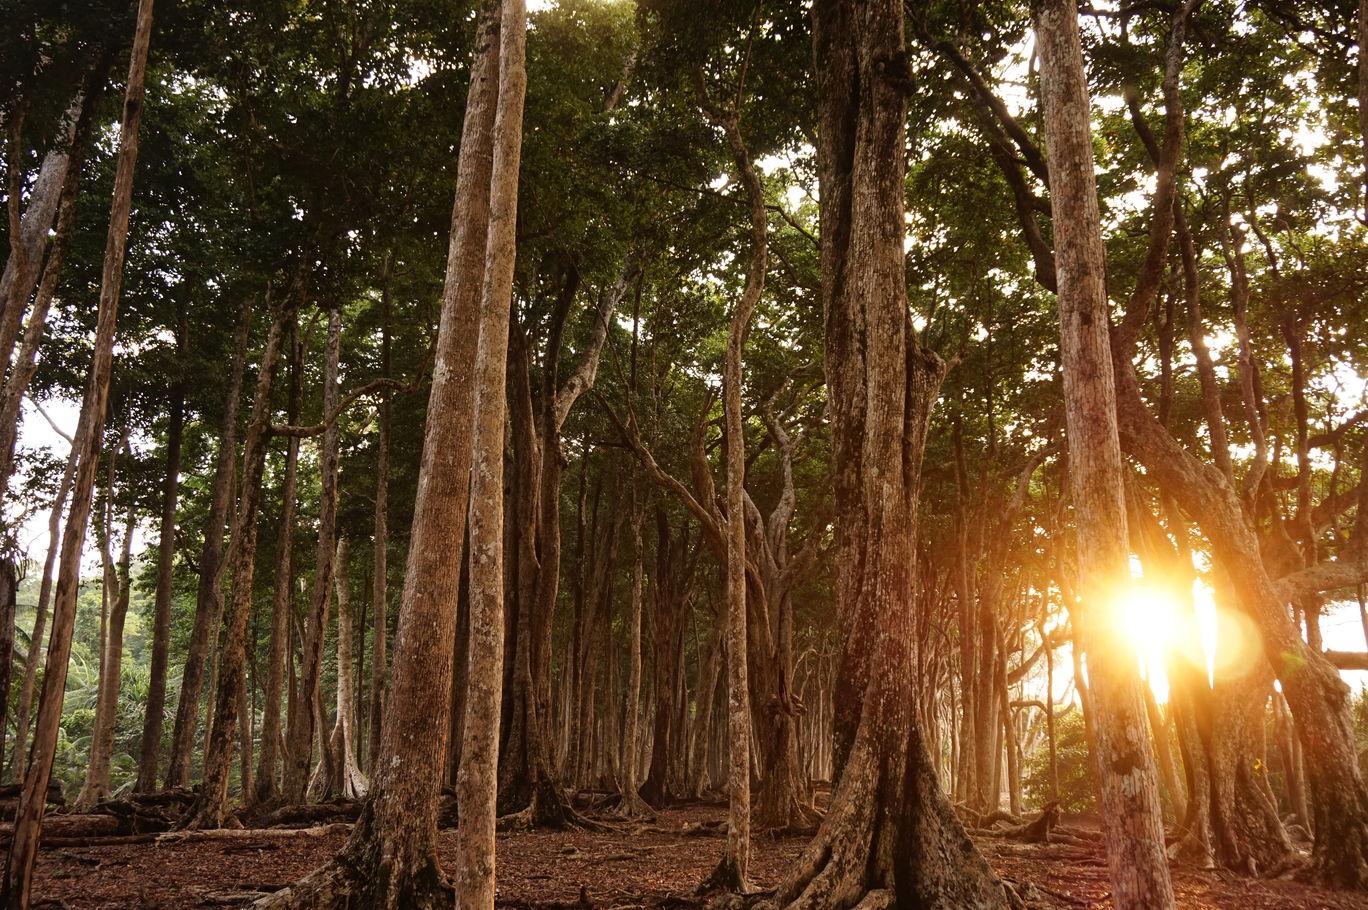 Photo of Andaman and Nicobar Islands By Karan Baath